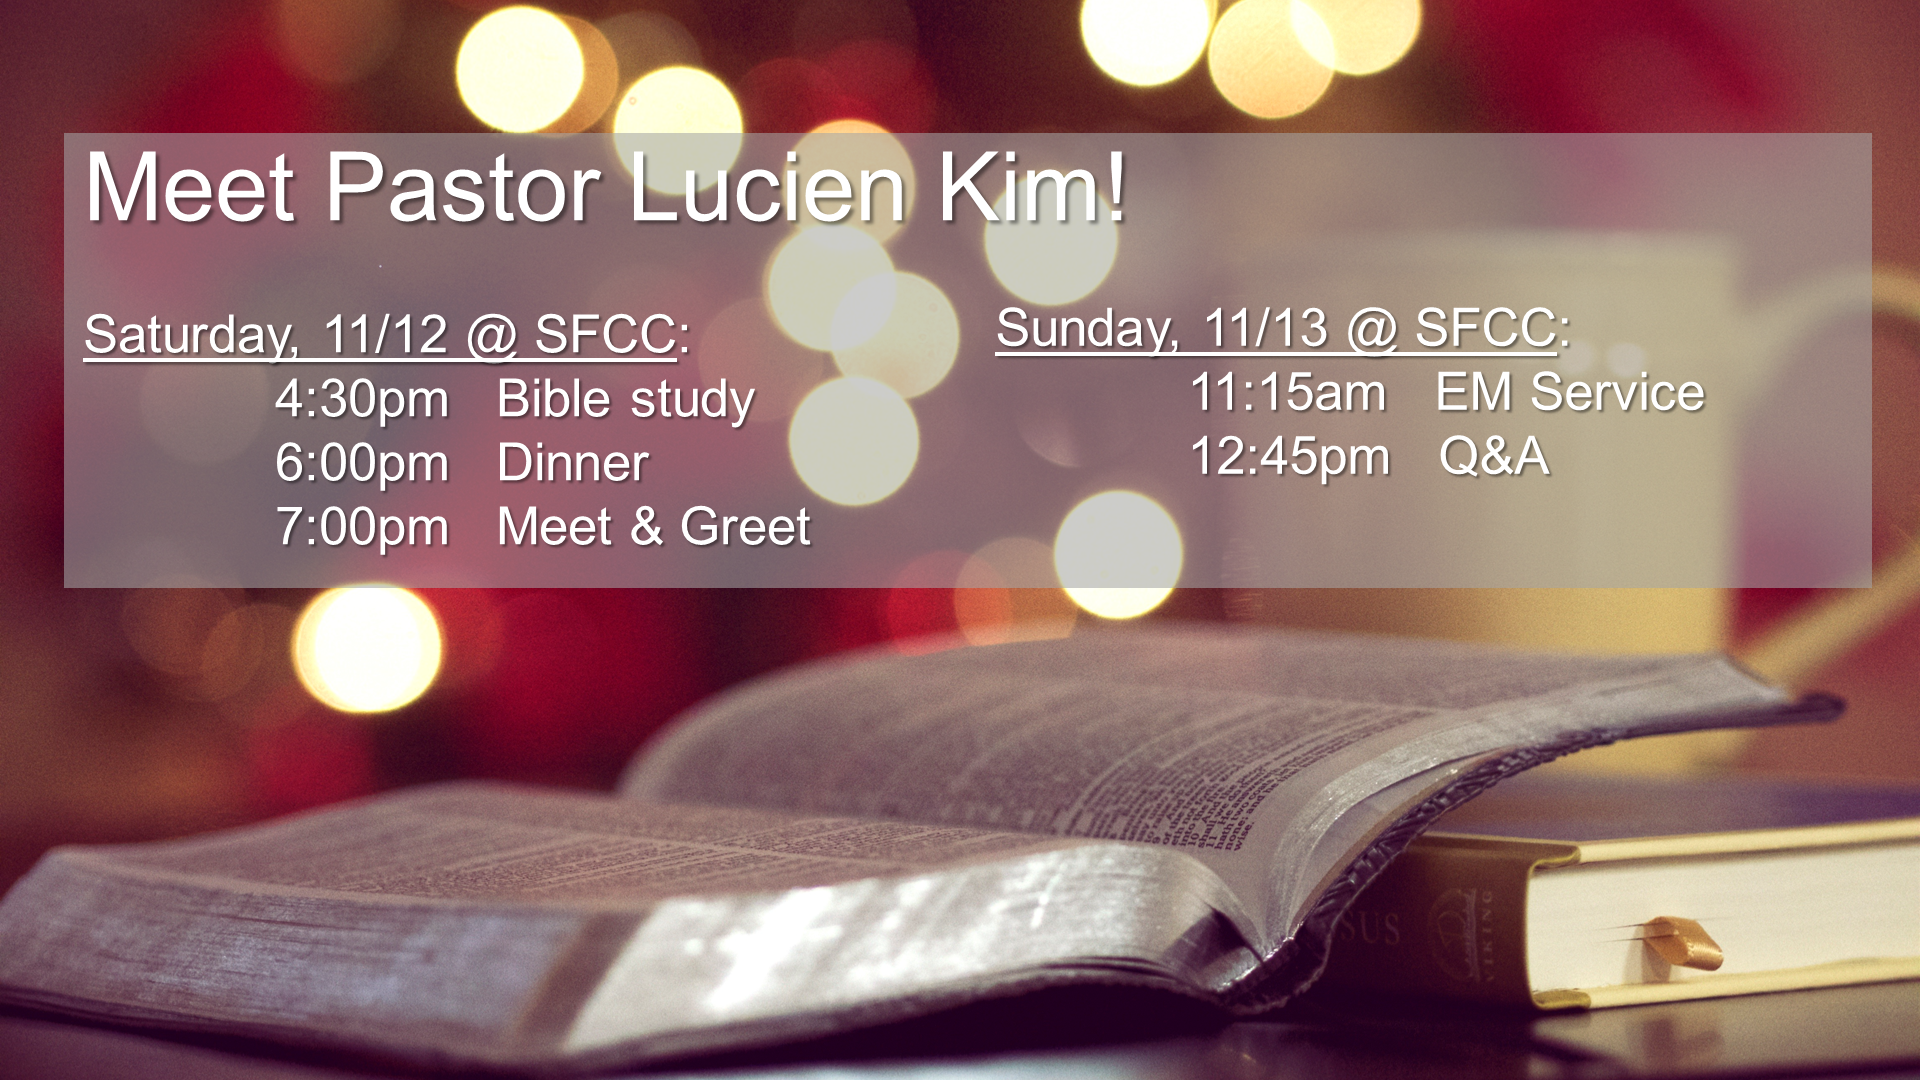 Pastor Lucien